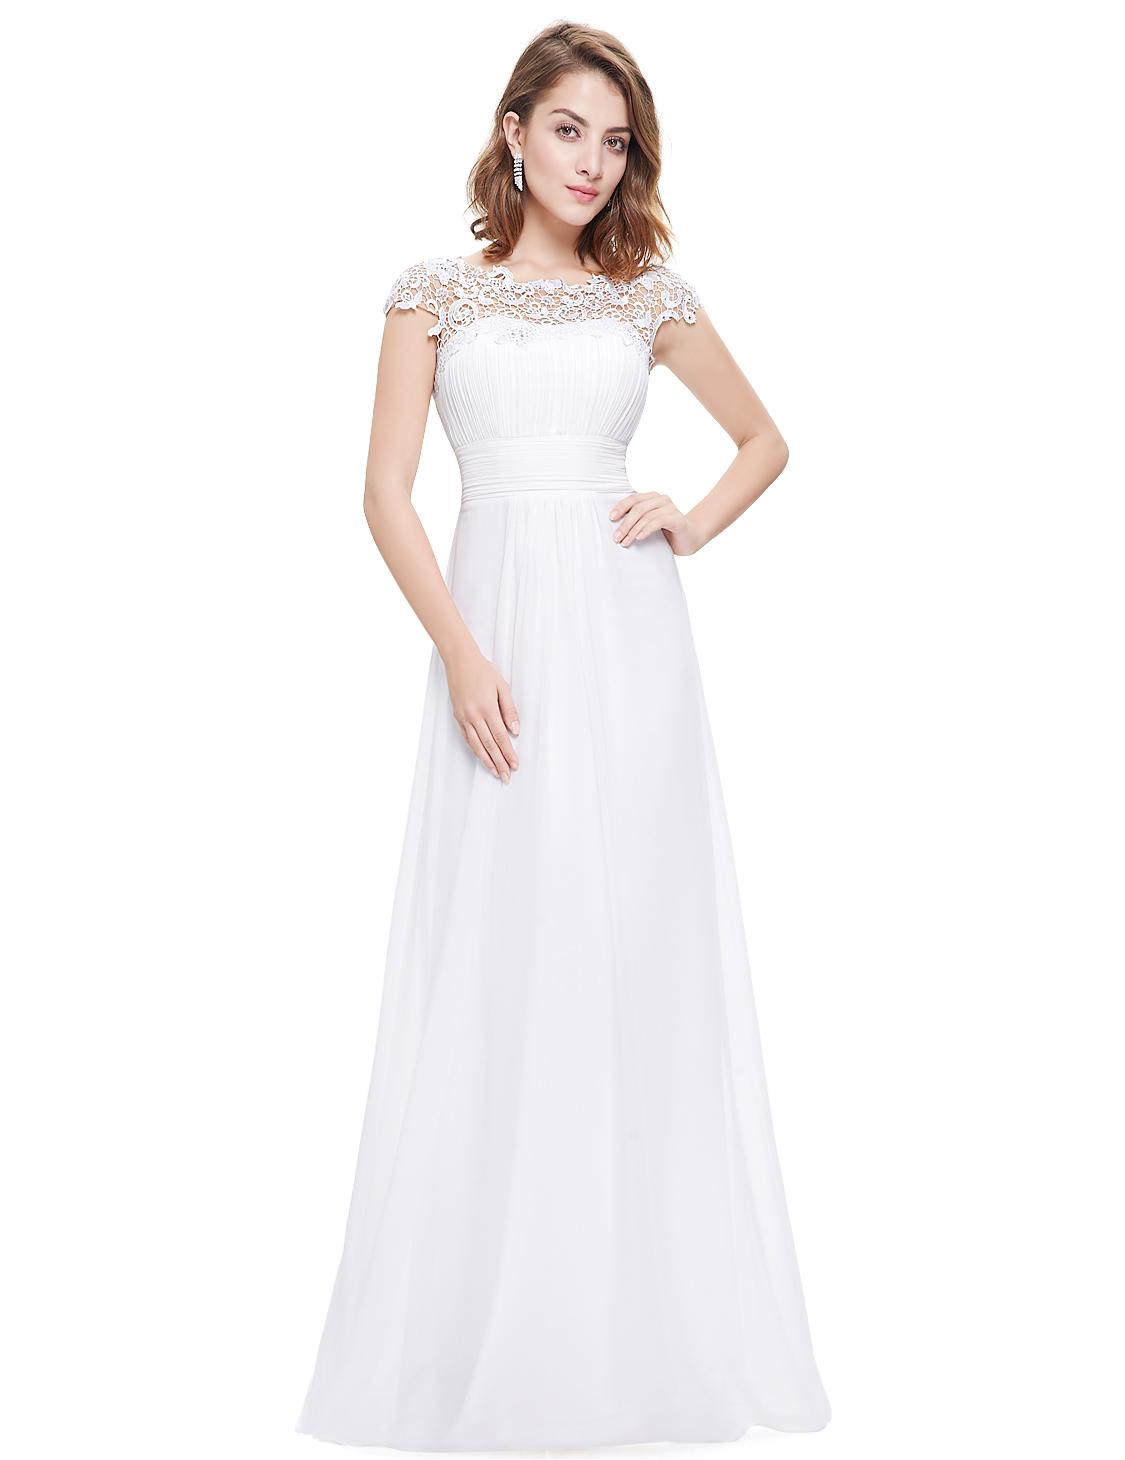 wedding dresses wedding dresses photo - 1